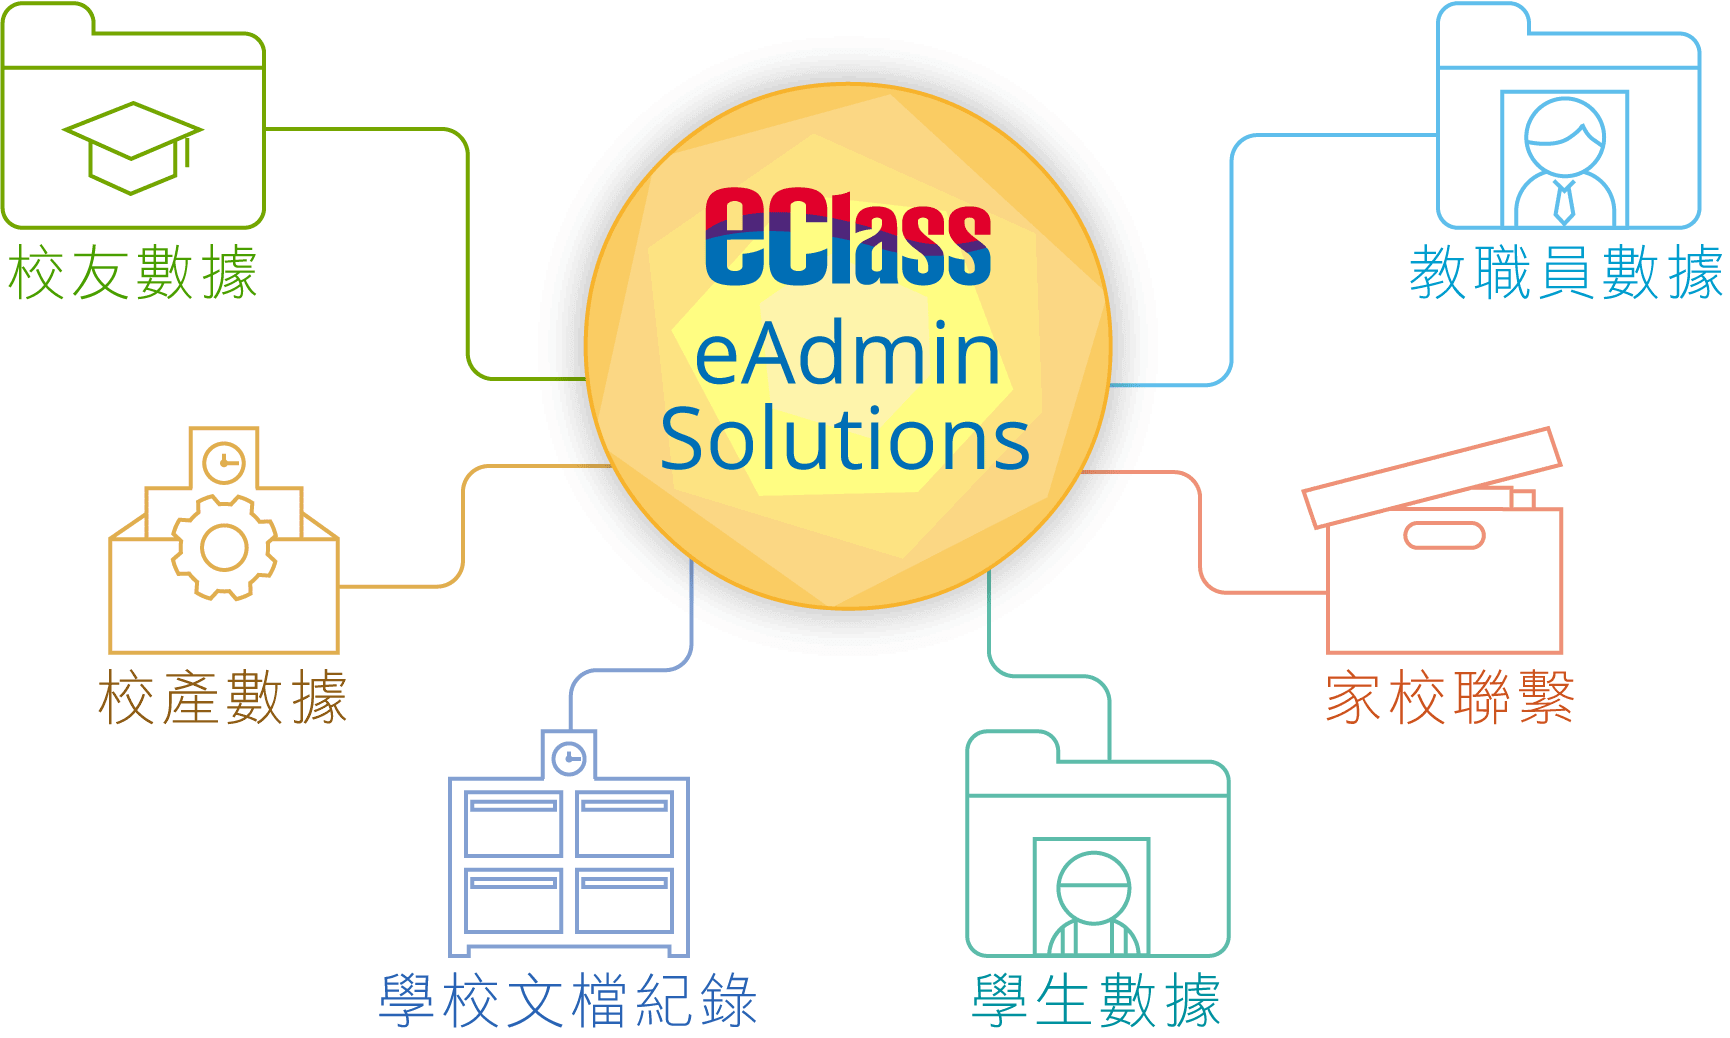 eClass-整全-行政方案